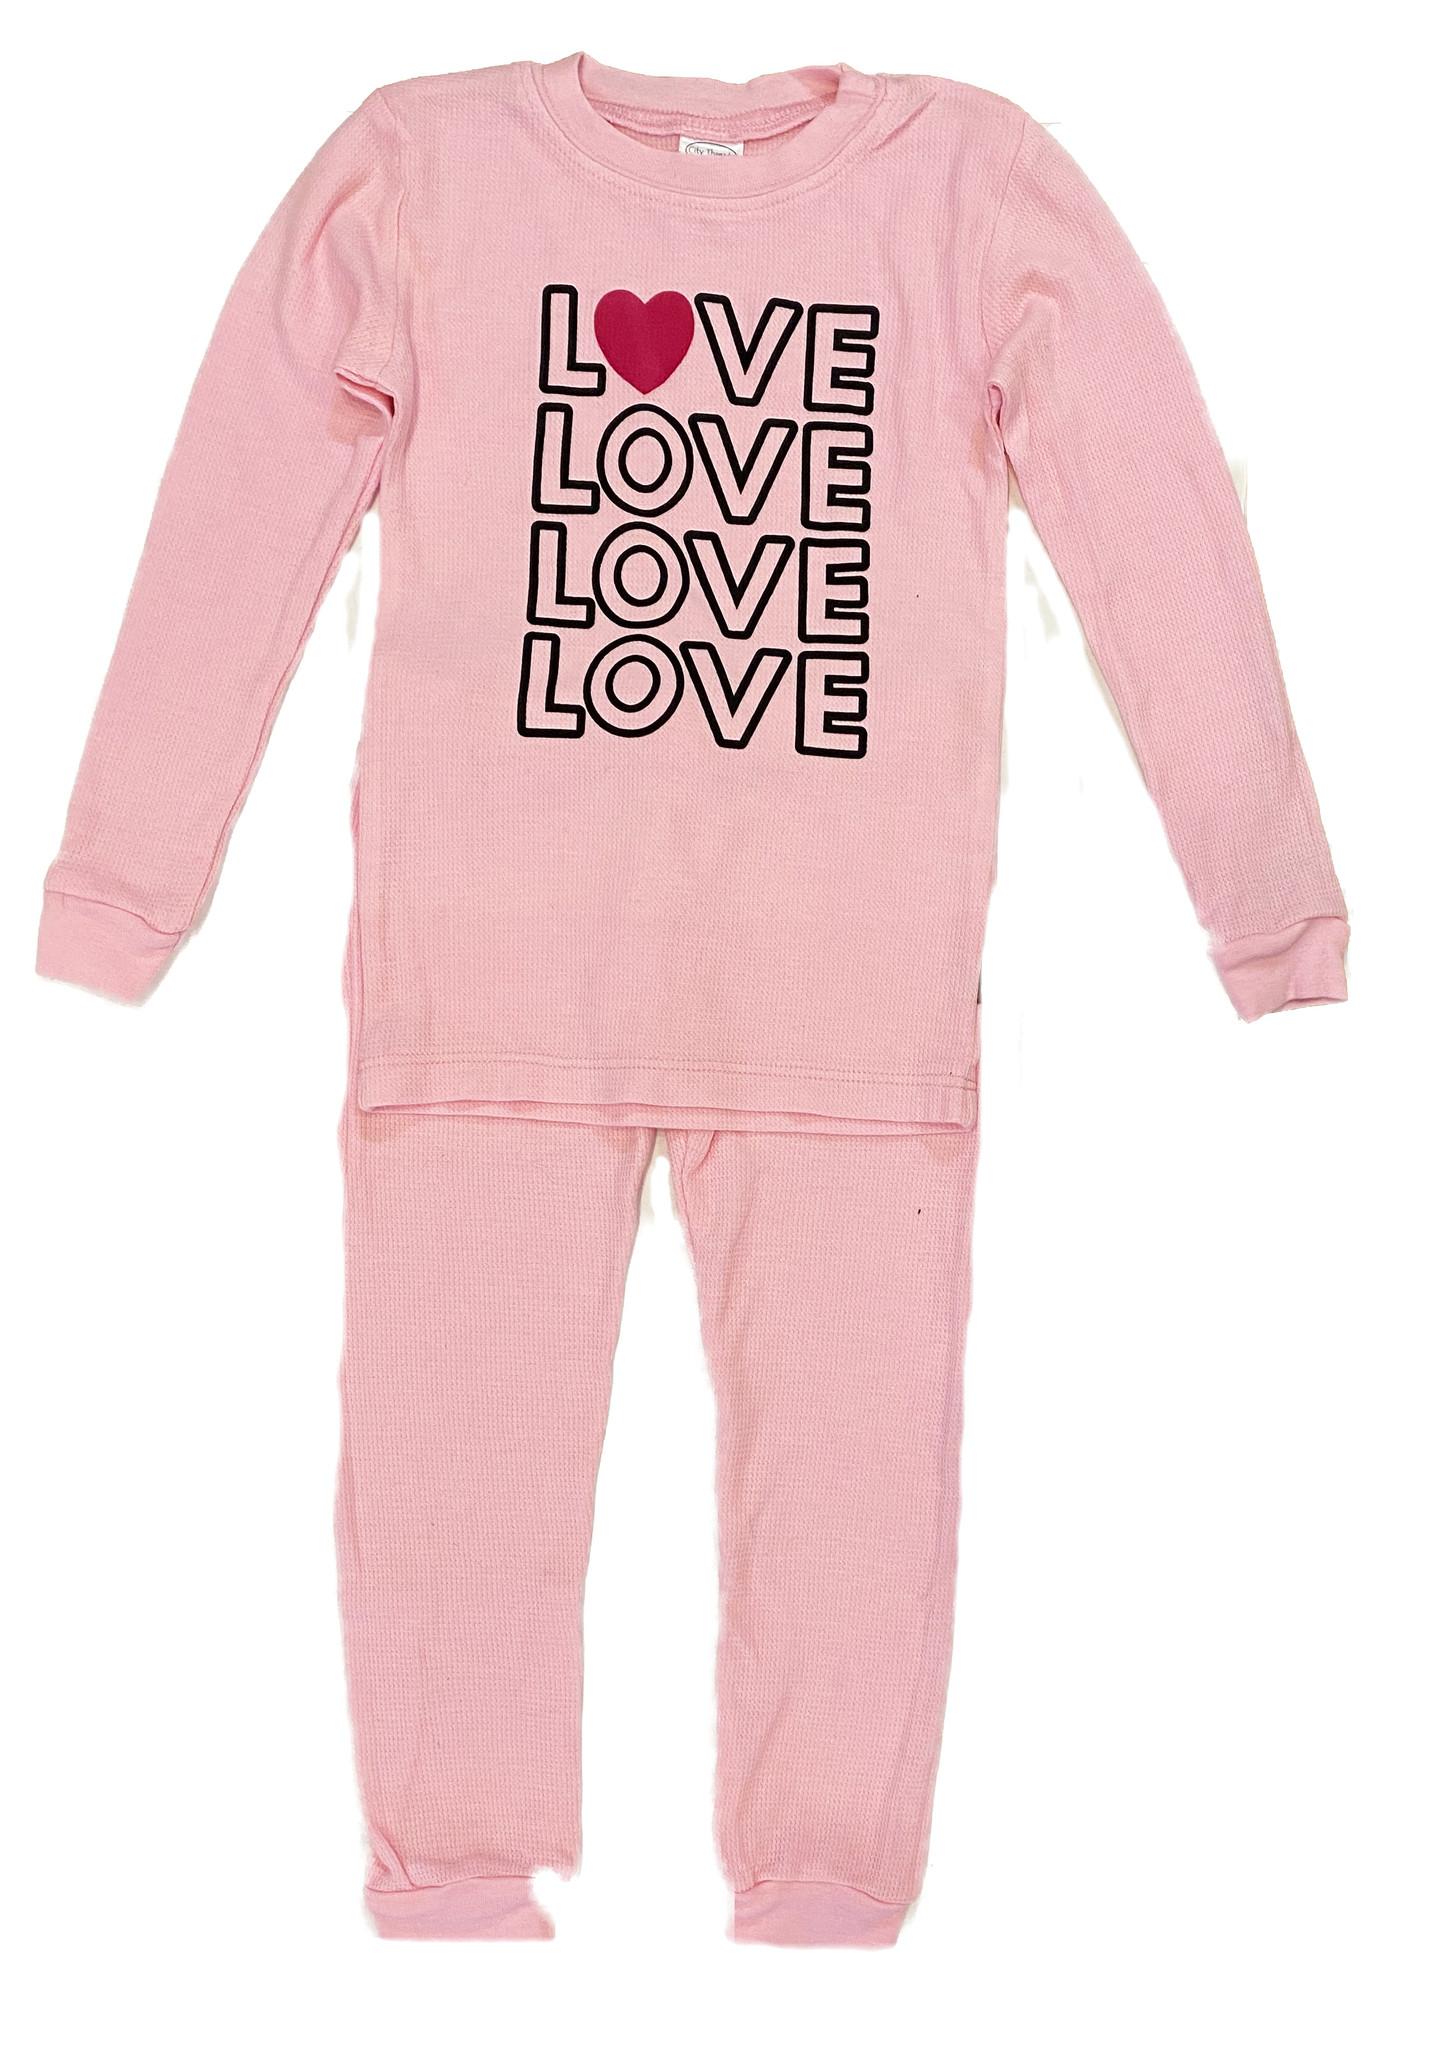 Love Heart Lt Pink Thermal PJ Set